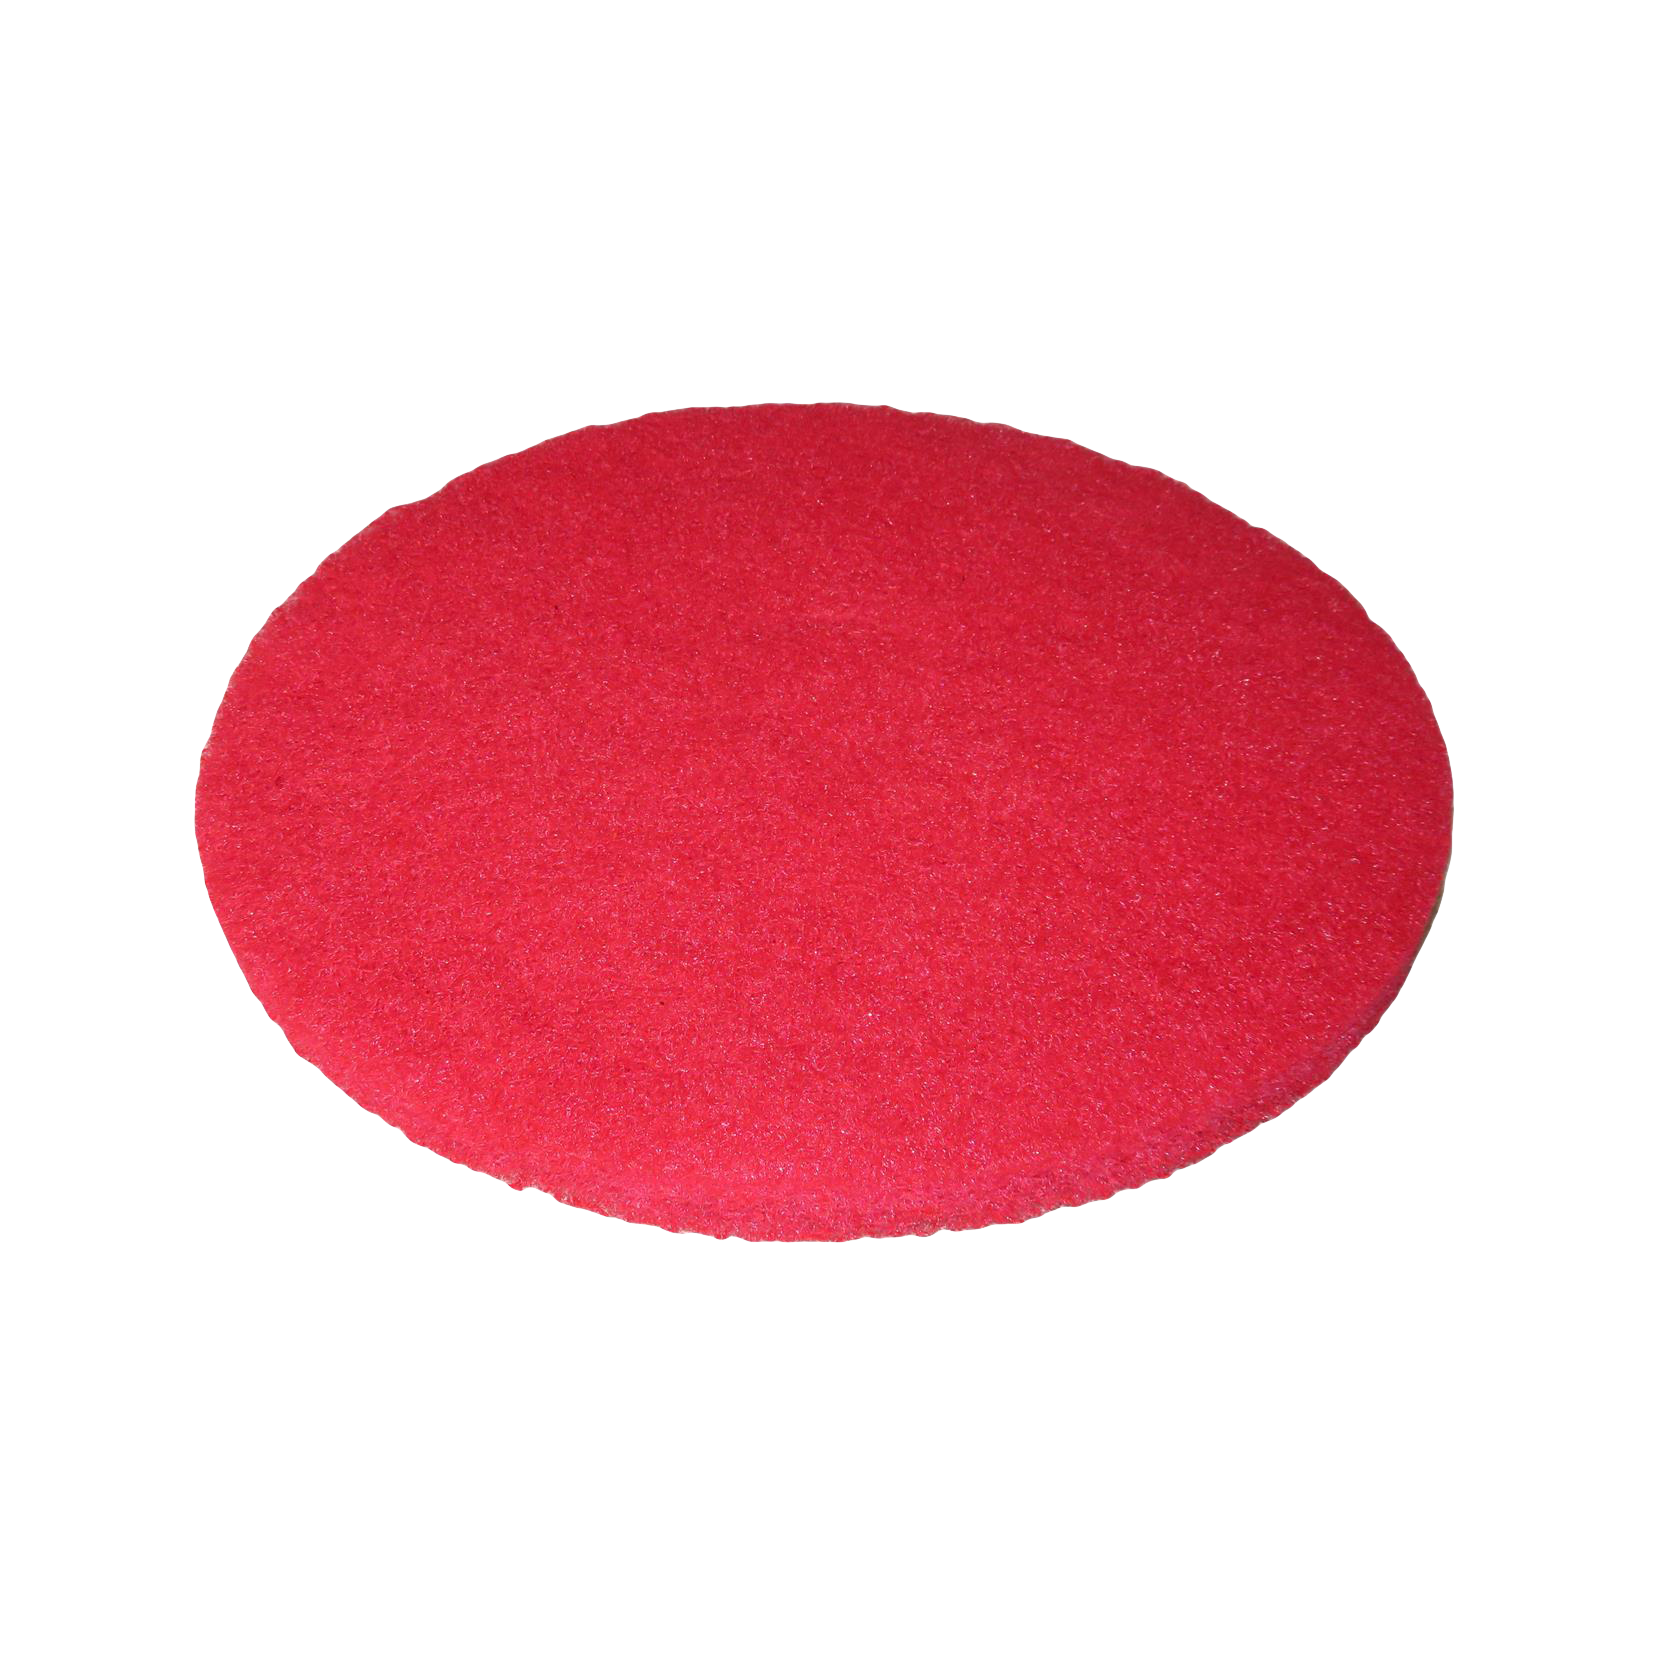 Hectoserve Red Floor Pads